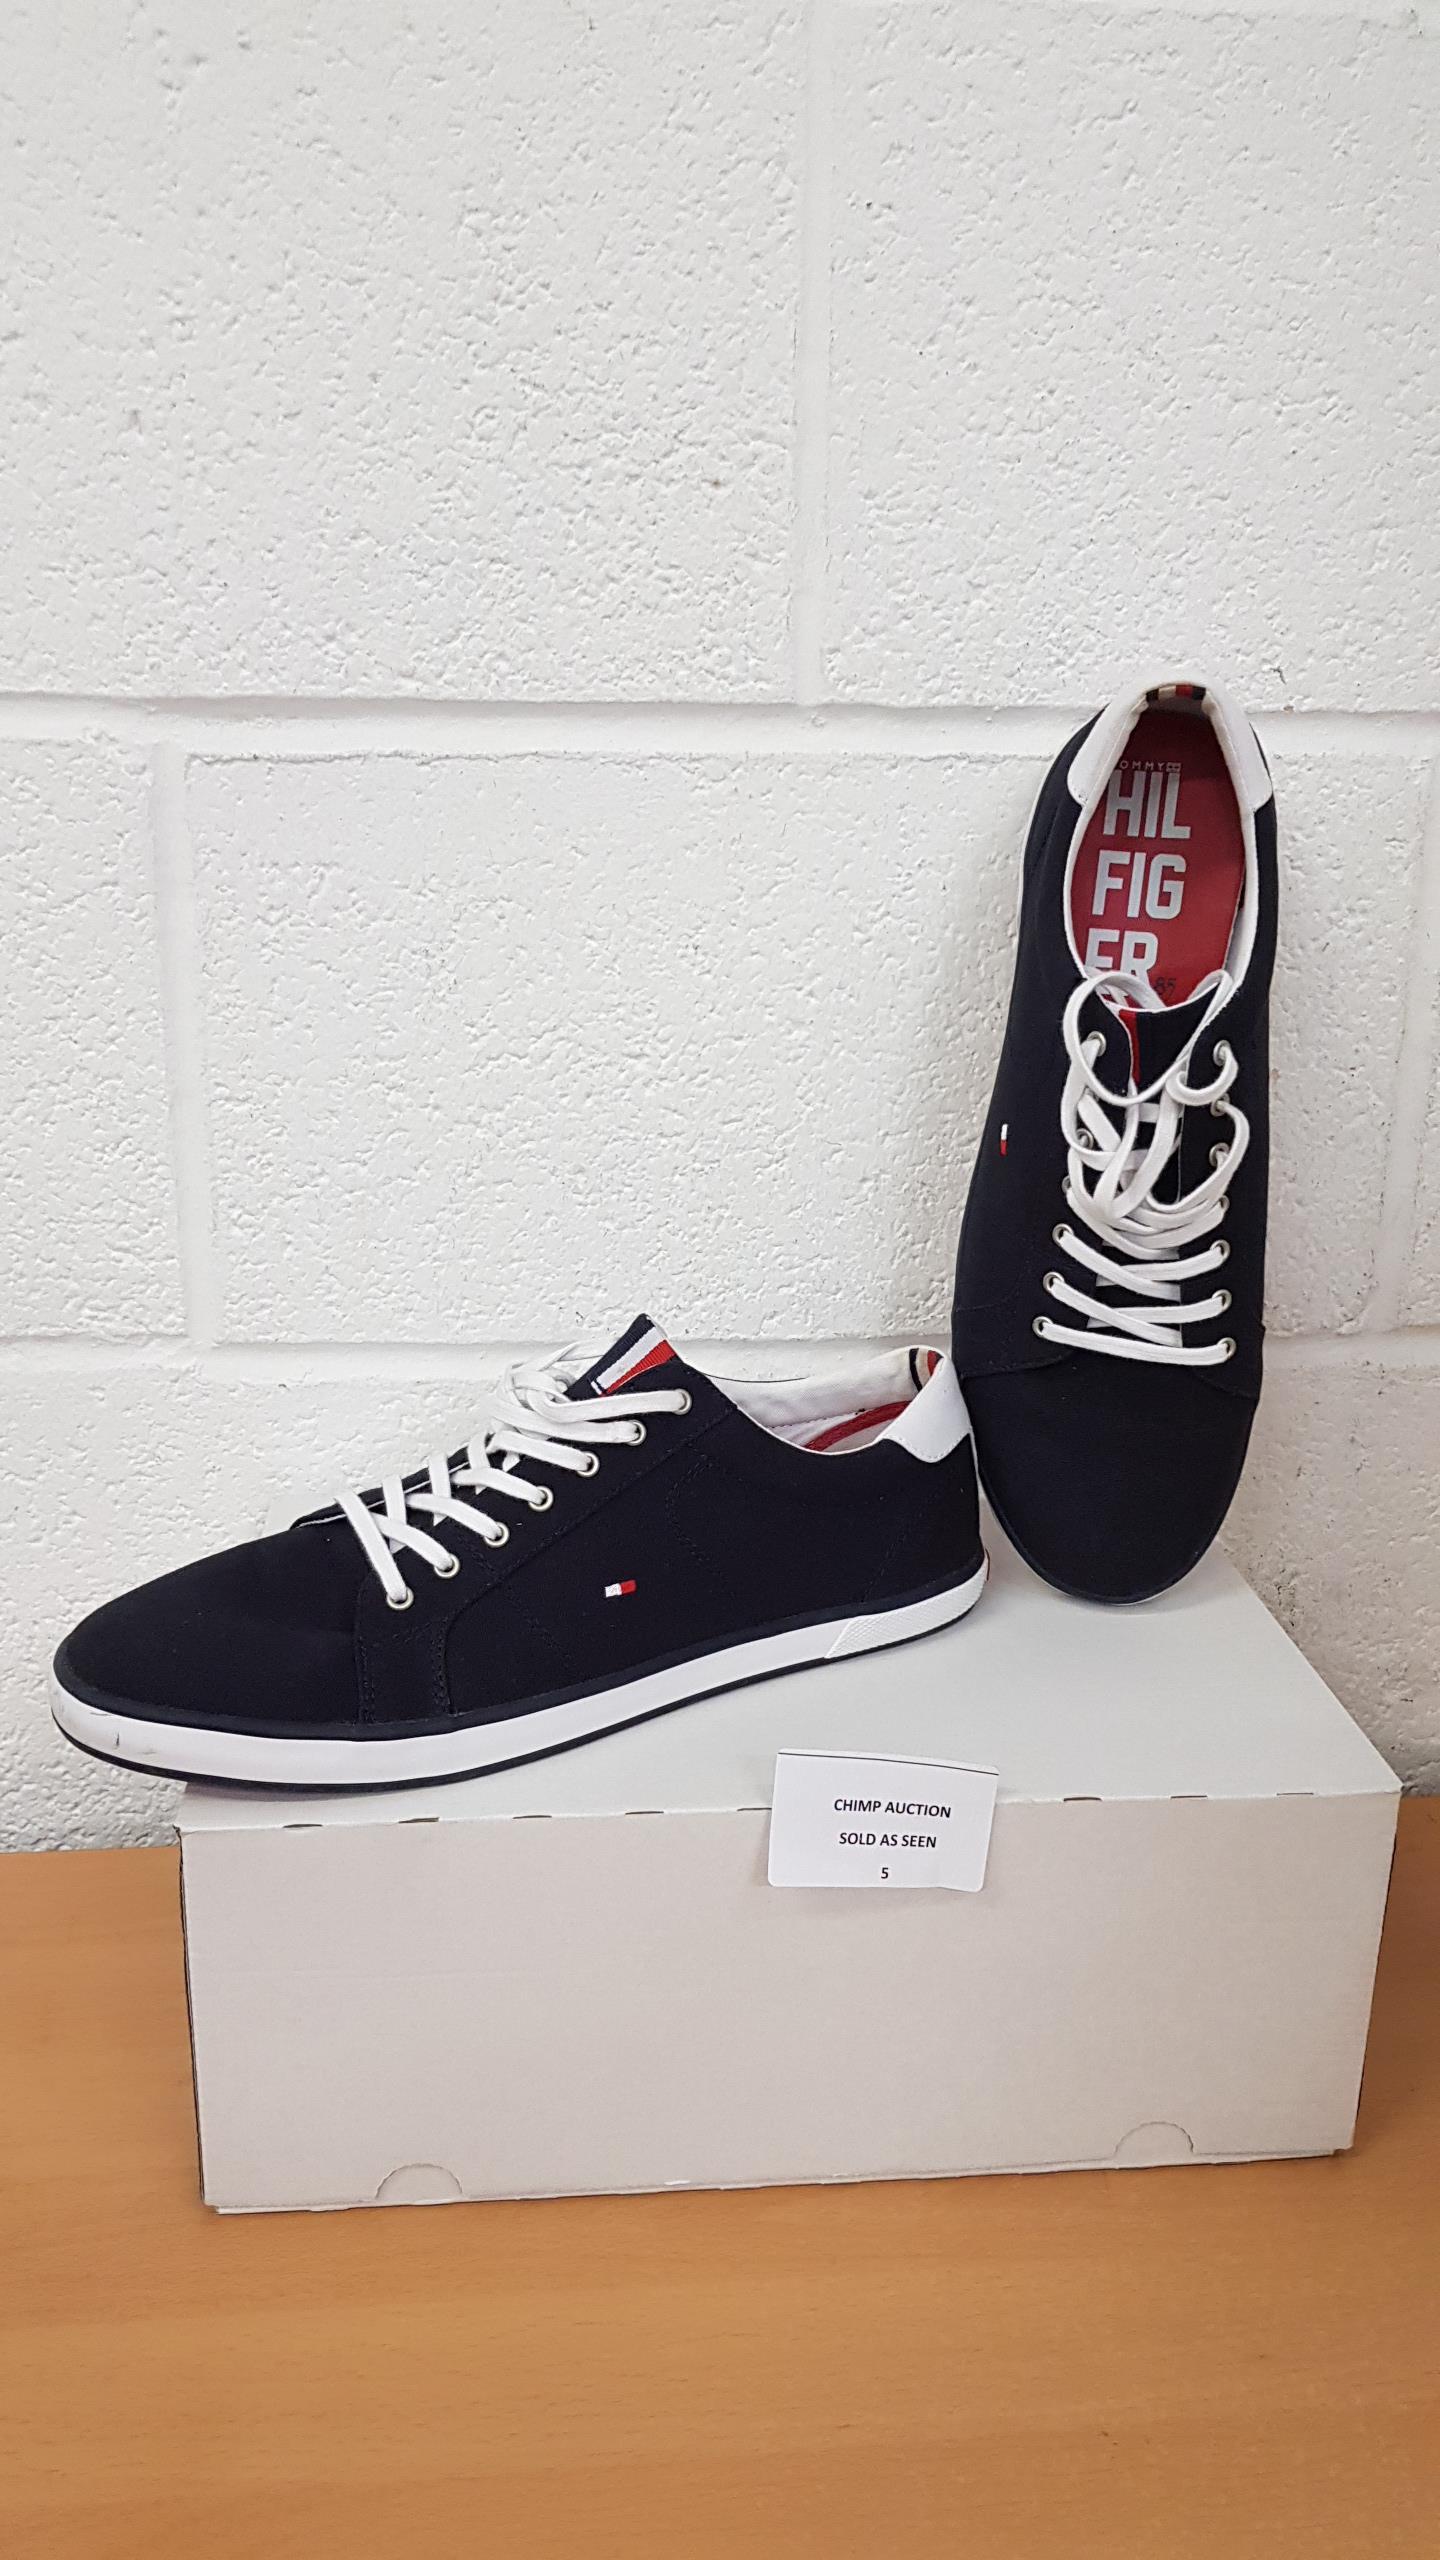 Lot 5 - Tommy Hilfiger men's shoes UK 10.5